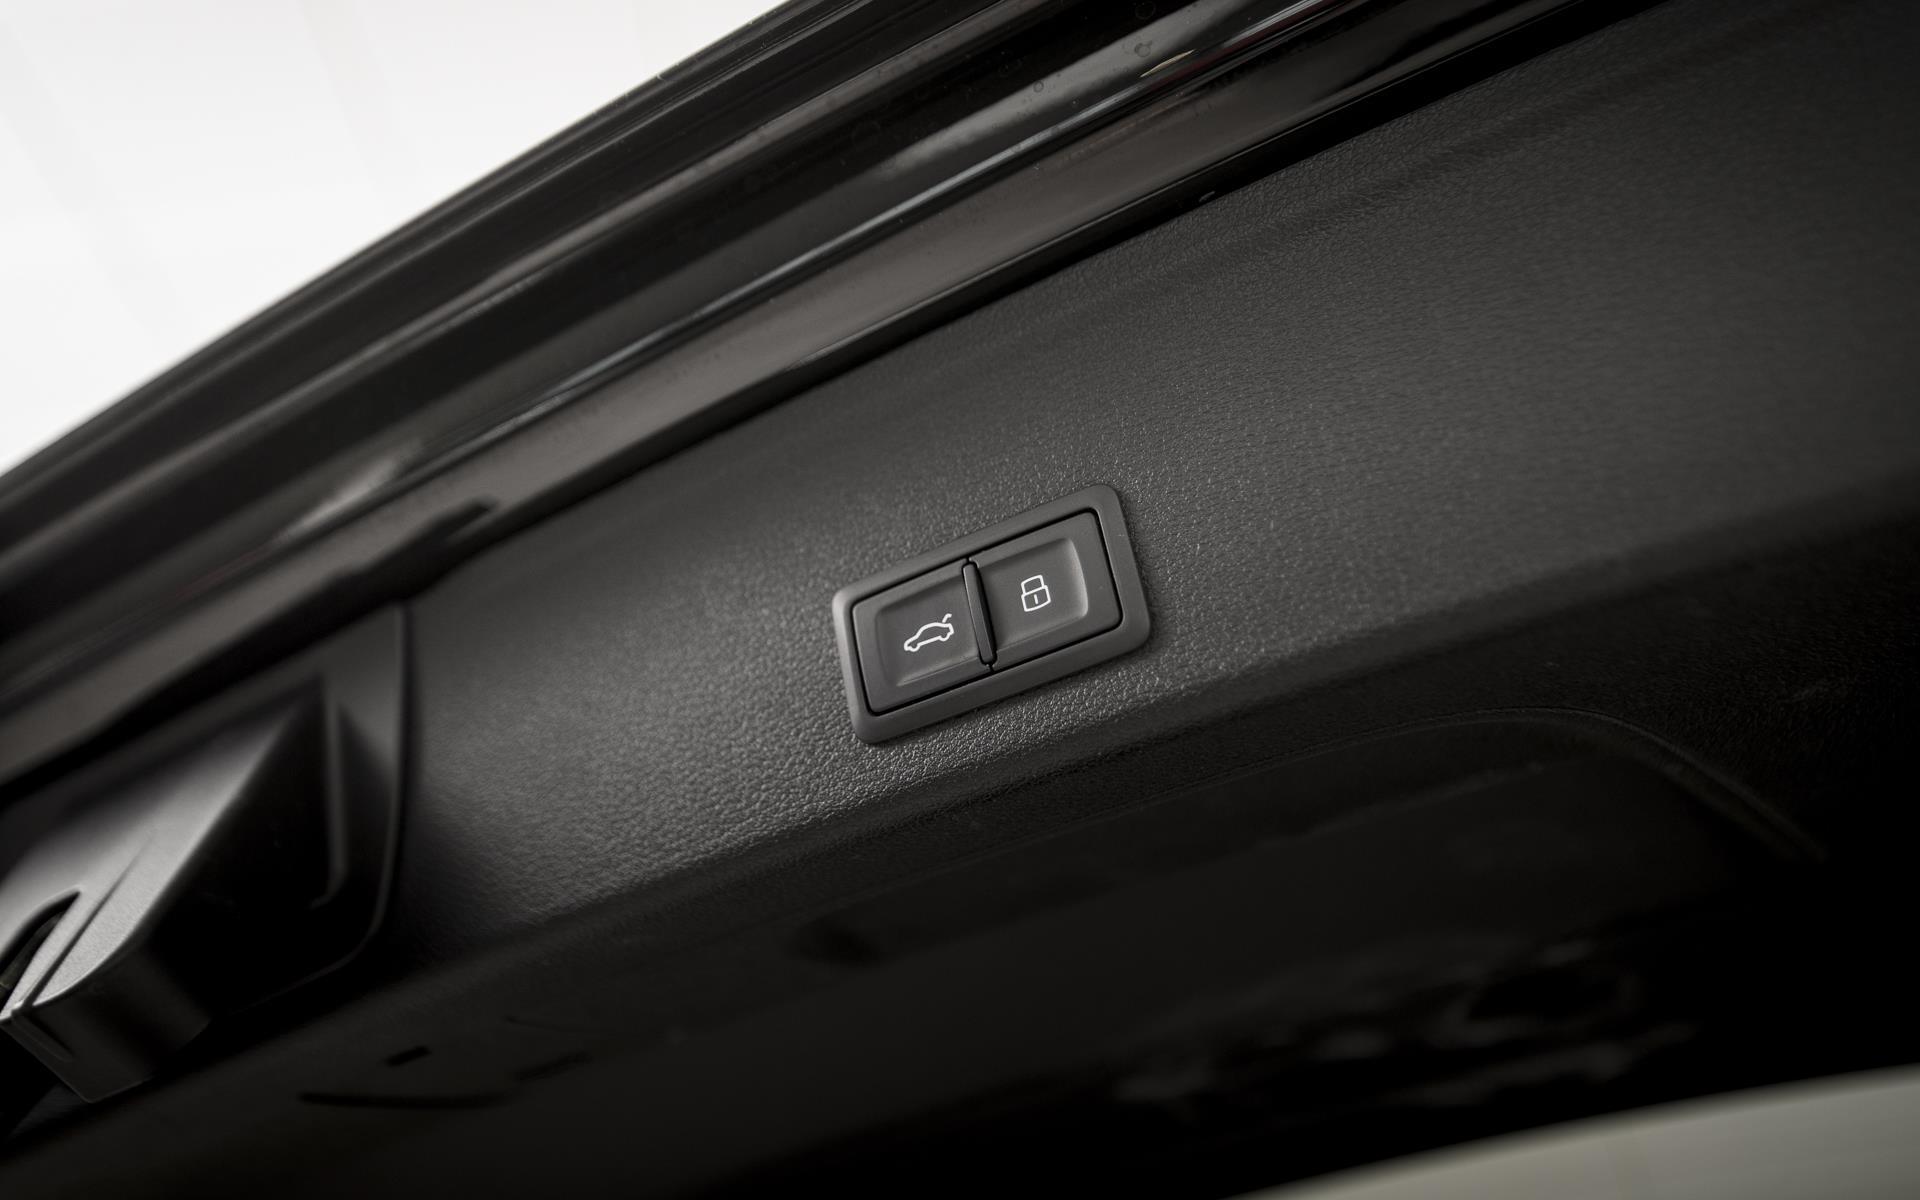 Avant 2,0 TDI S-Line Black Edition TipTronic 190HK Stc  image24